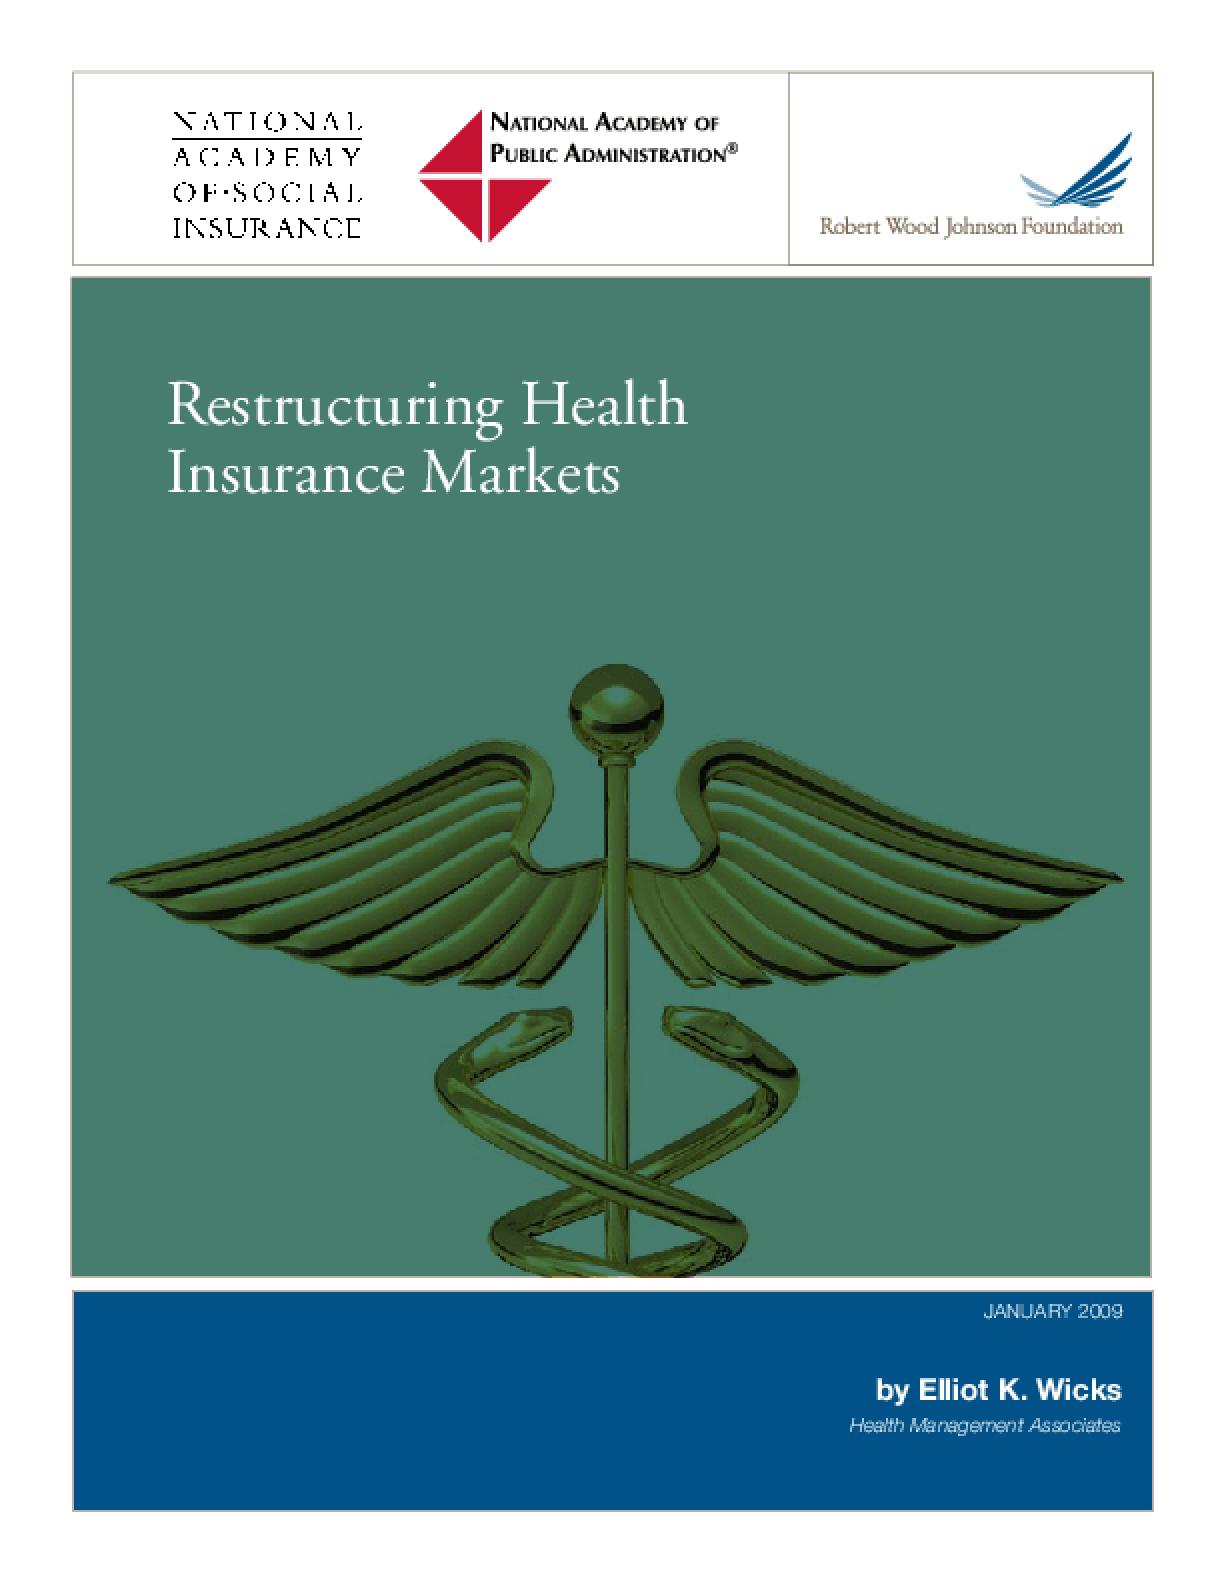 Restructuring Health Insurance Markets